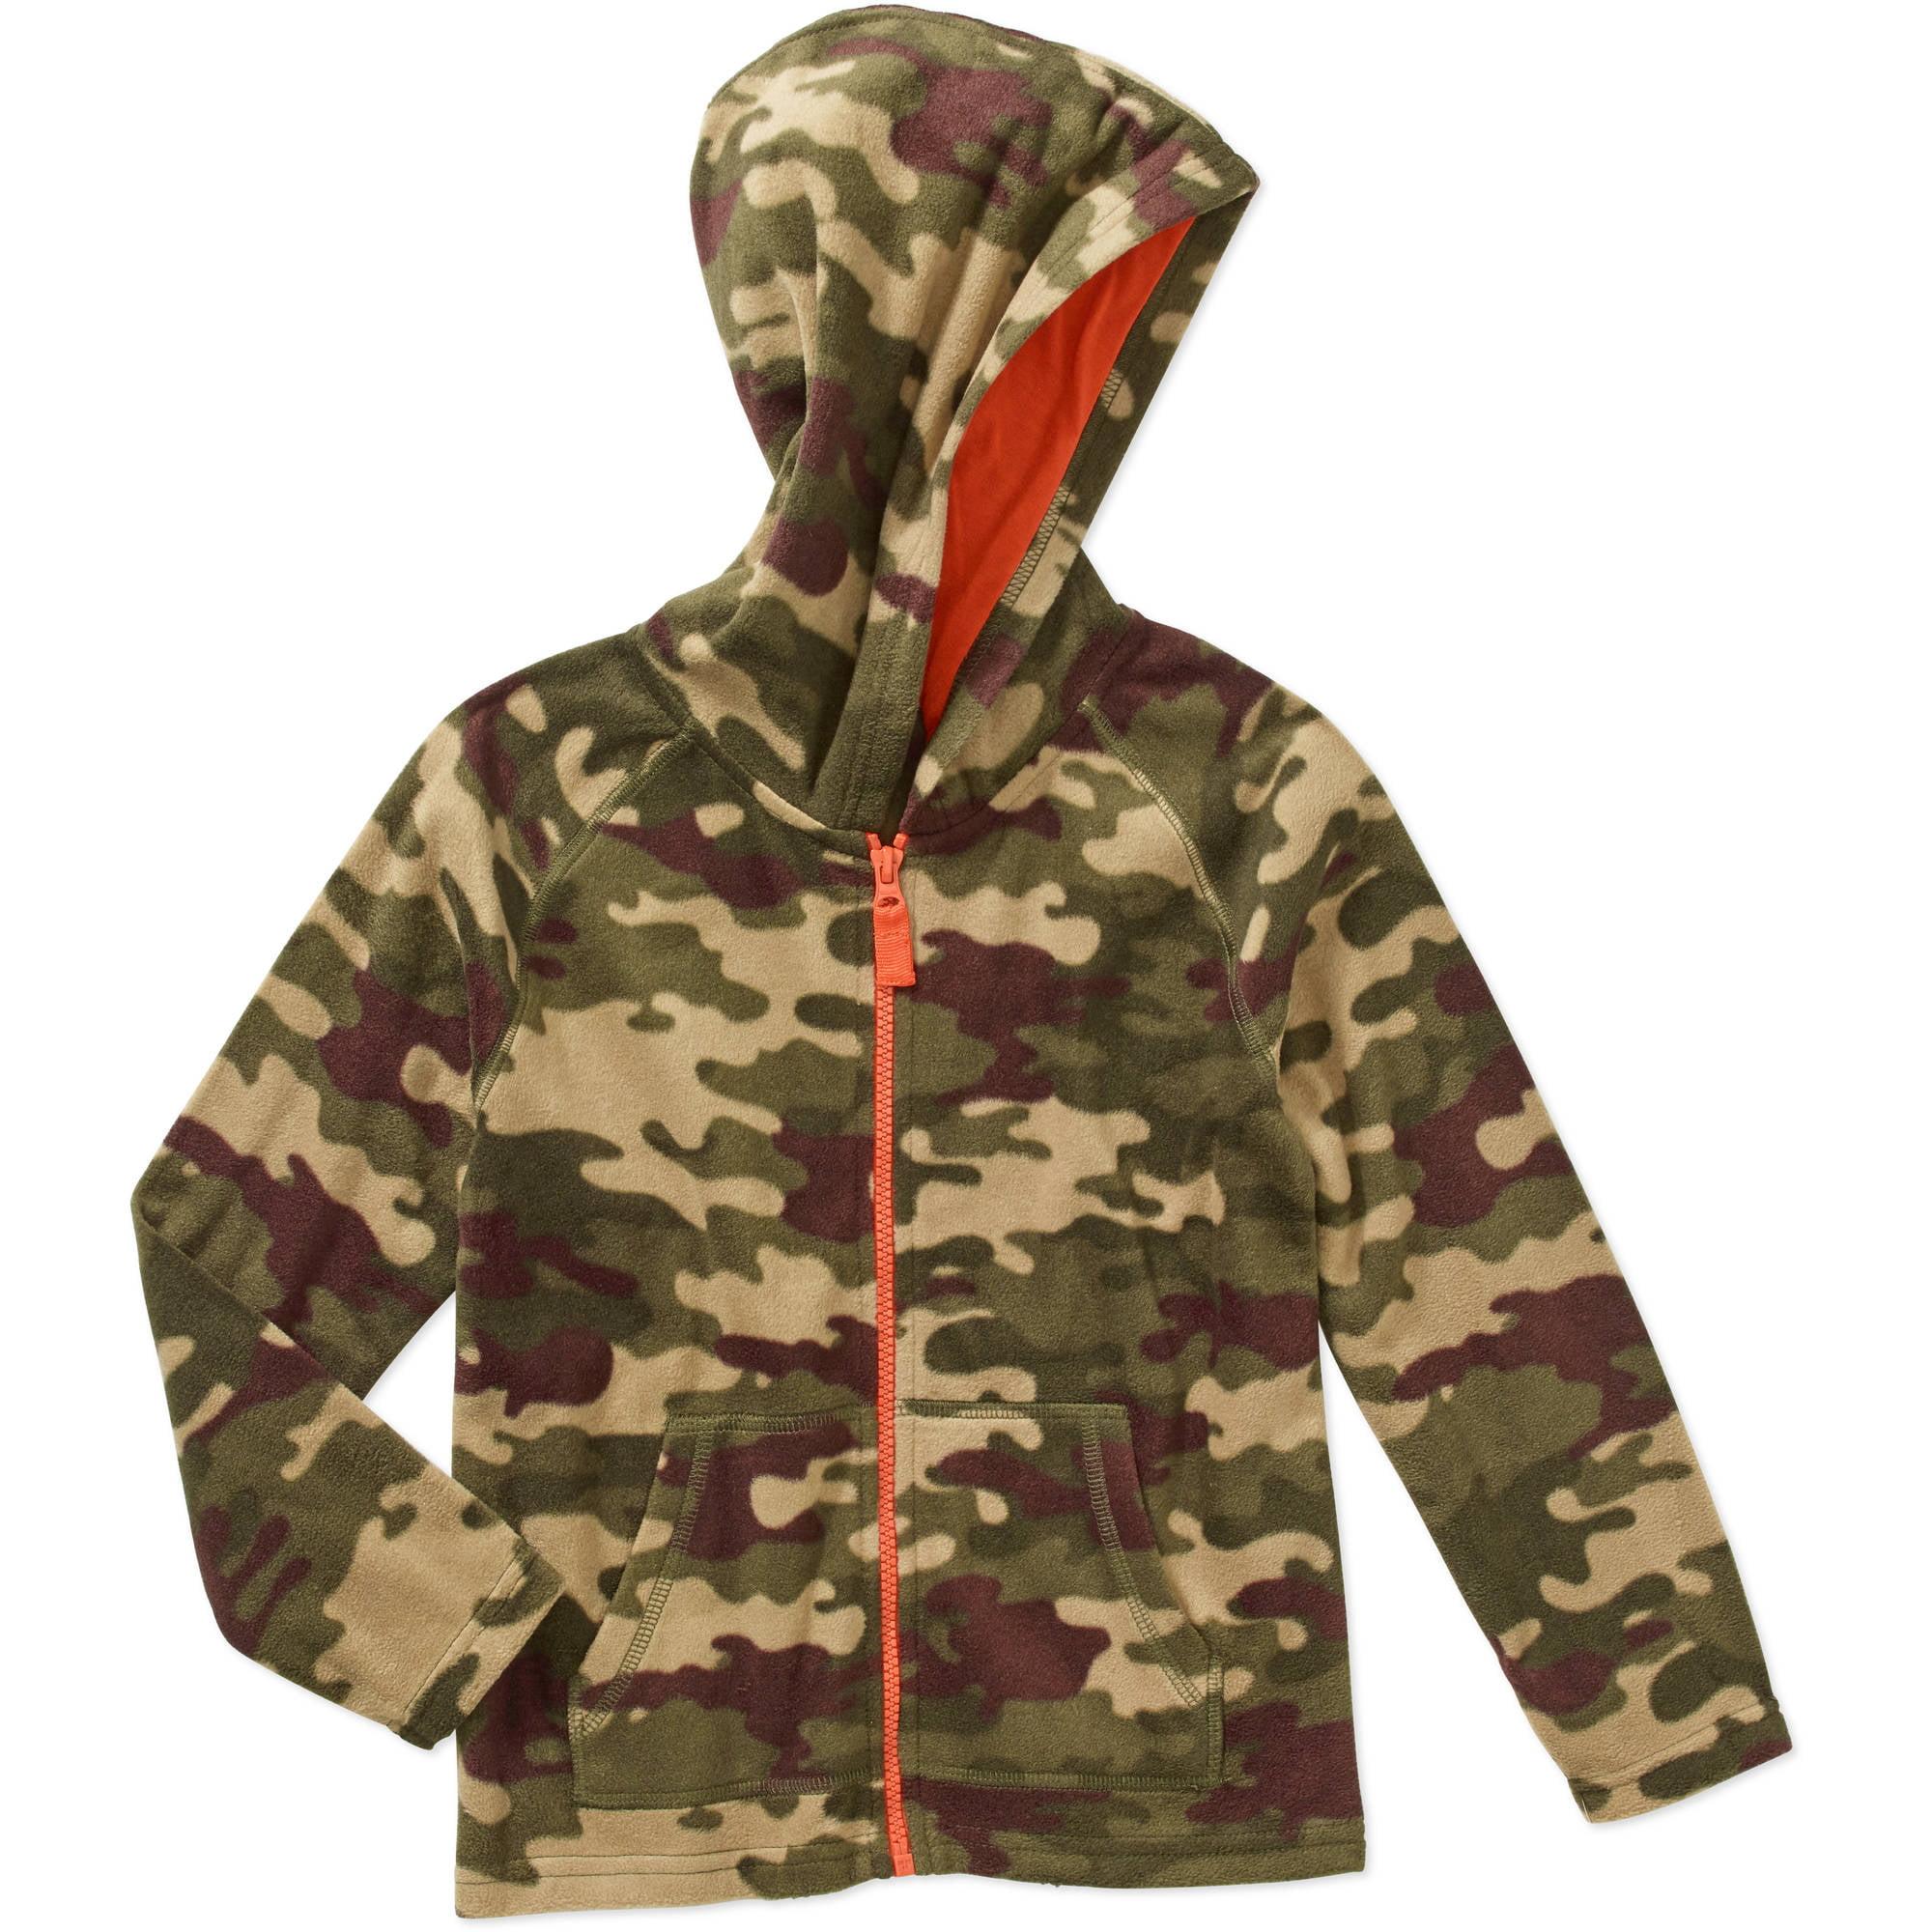 365 Kids From Garanimals Boys Printed Micro Fleece Full Zip Hooded Jacket